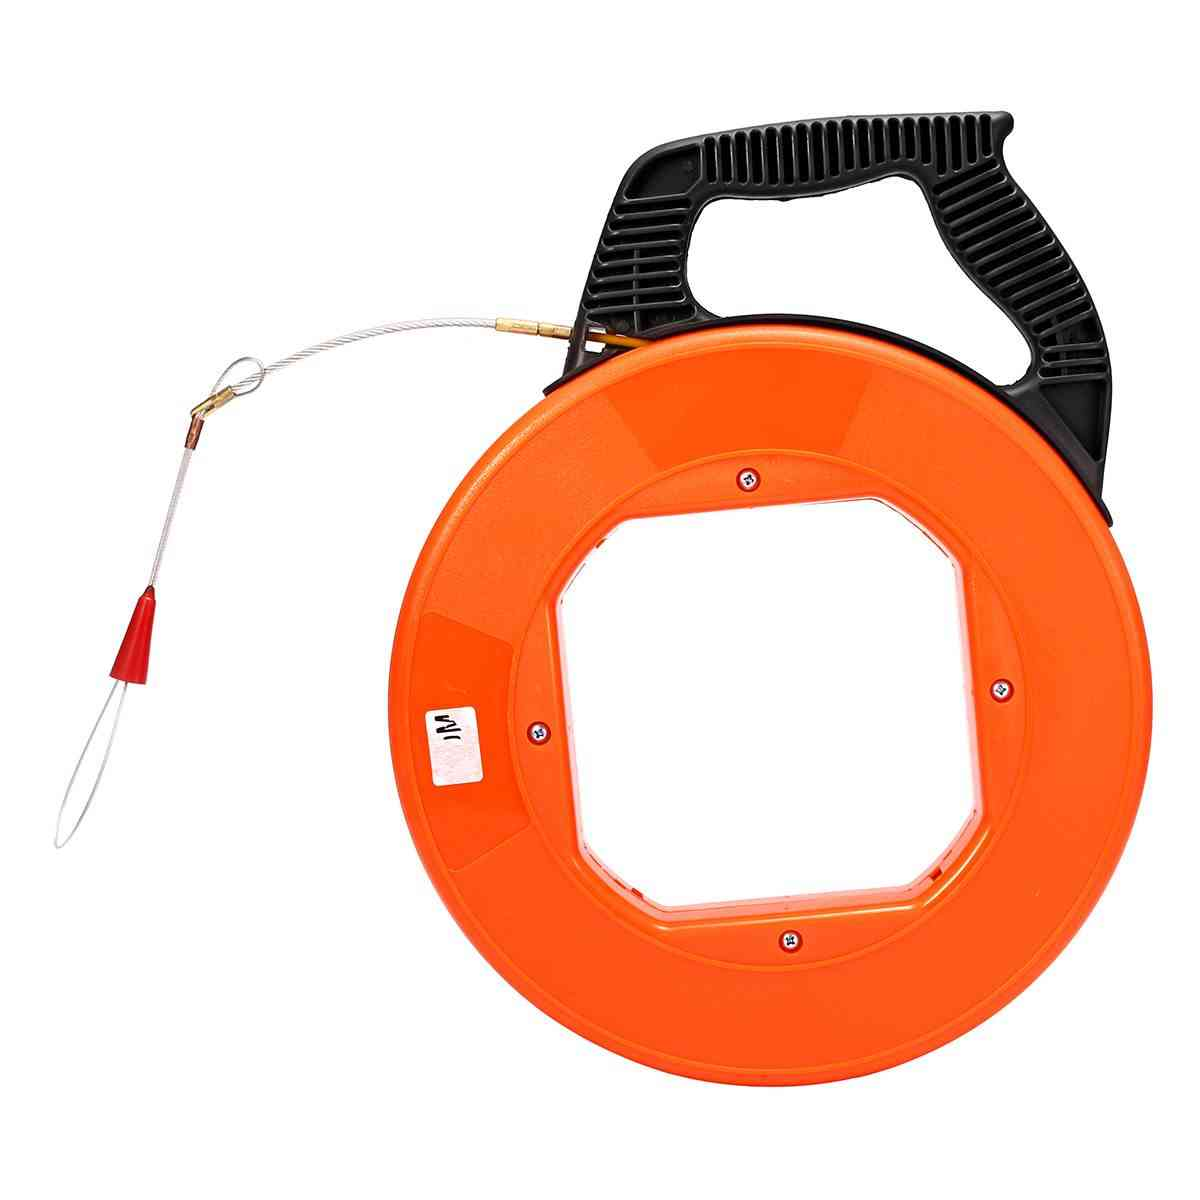 Fiberglass Fish Tape-reel Puller Conduit Rodder, Pulling Wire Cable Kit